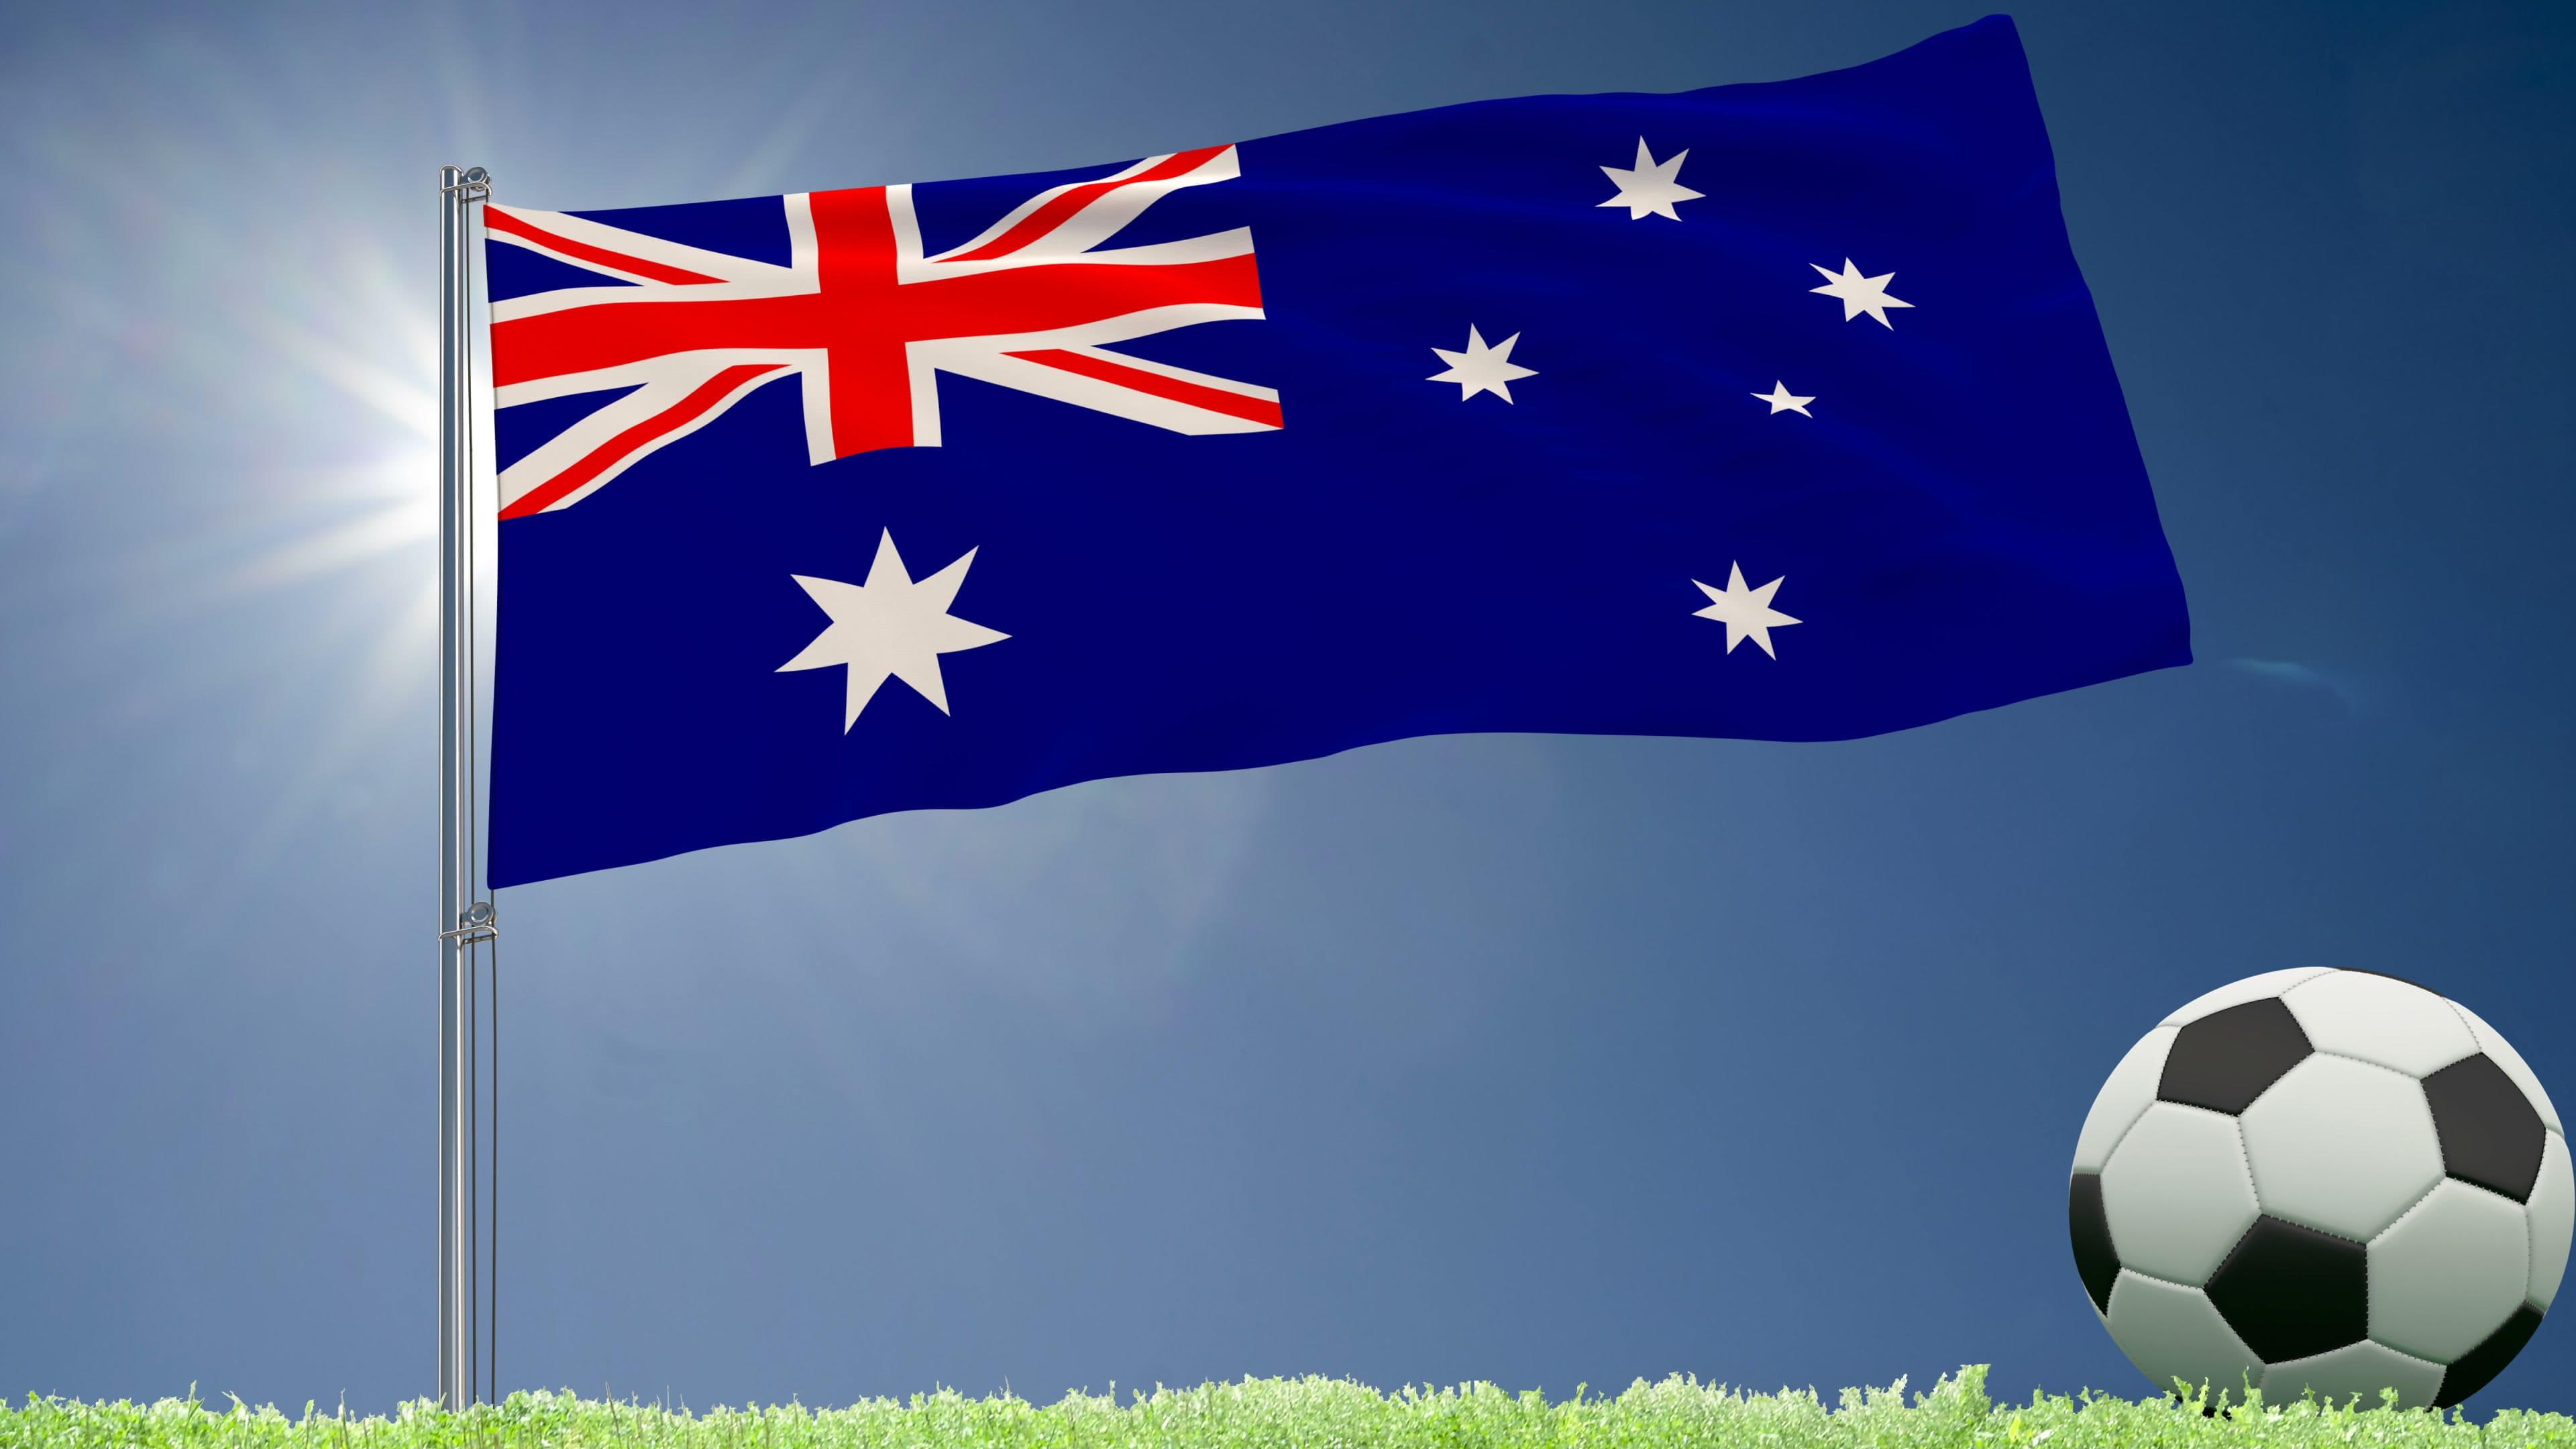 flaga i piłka